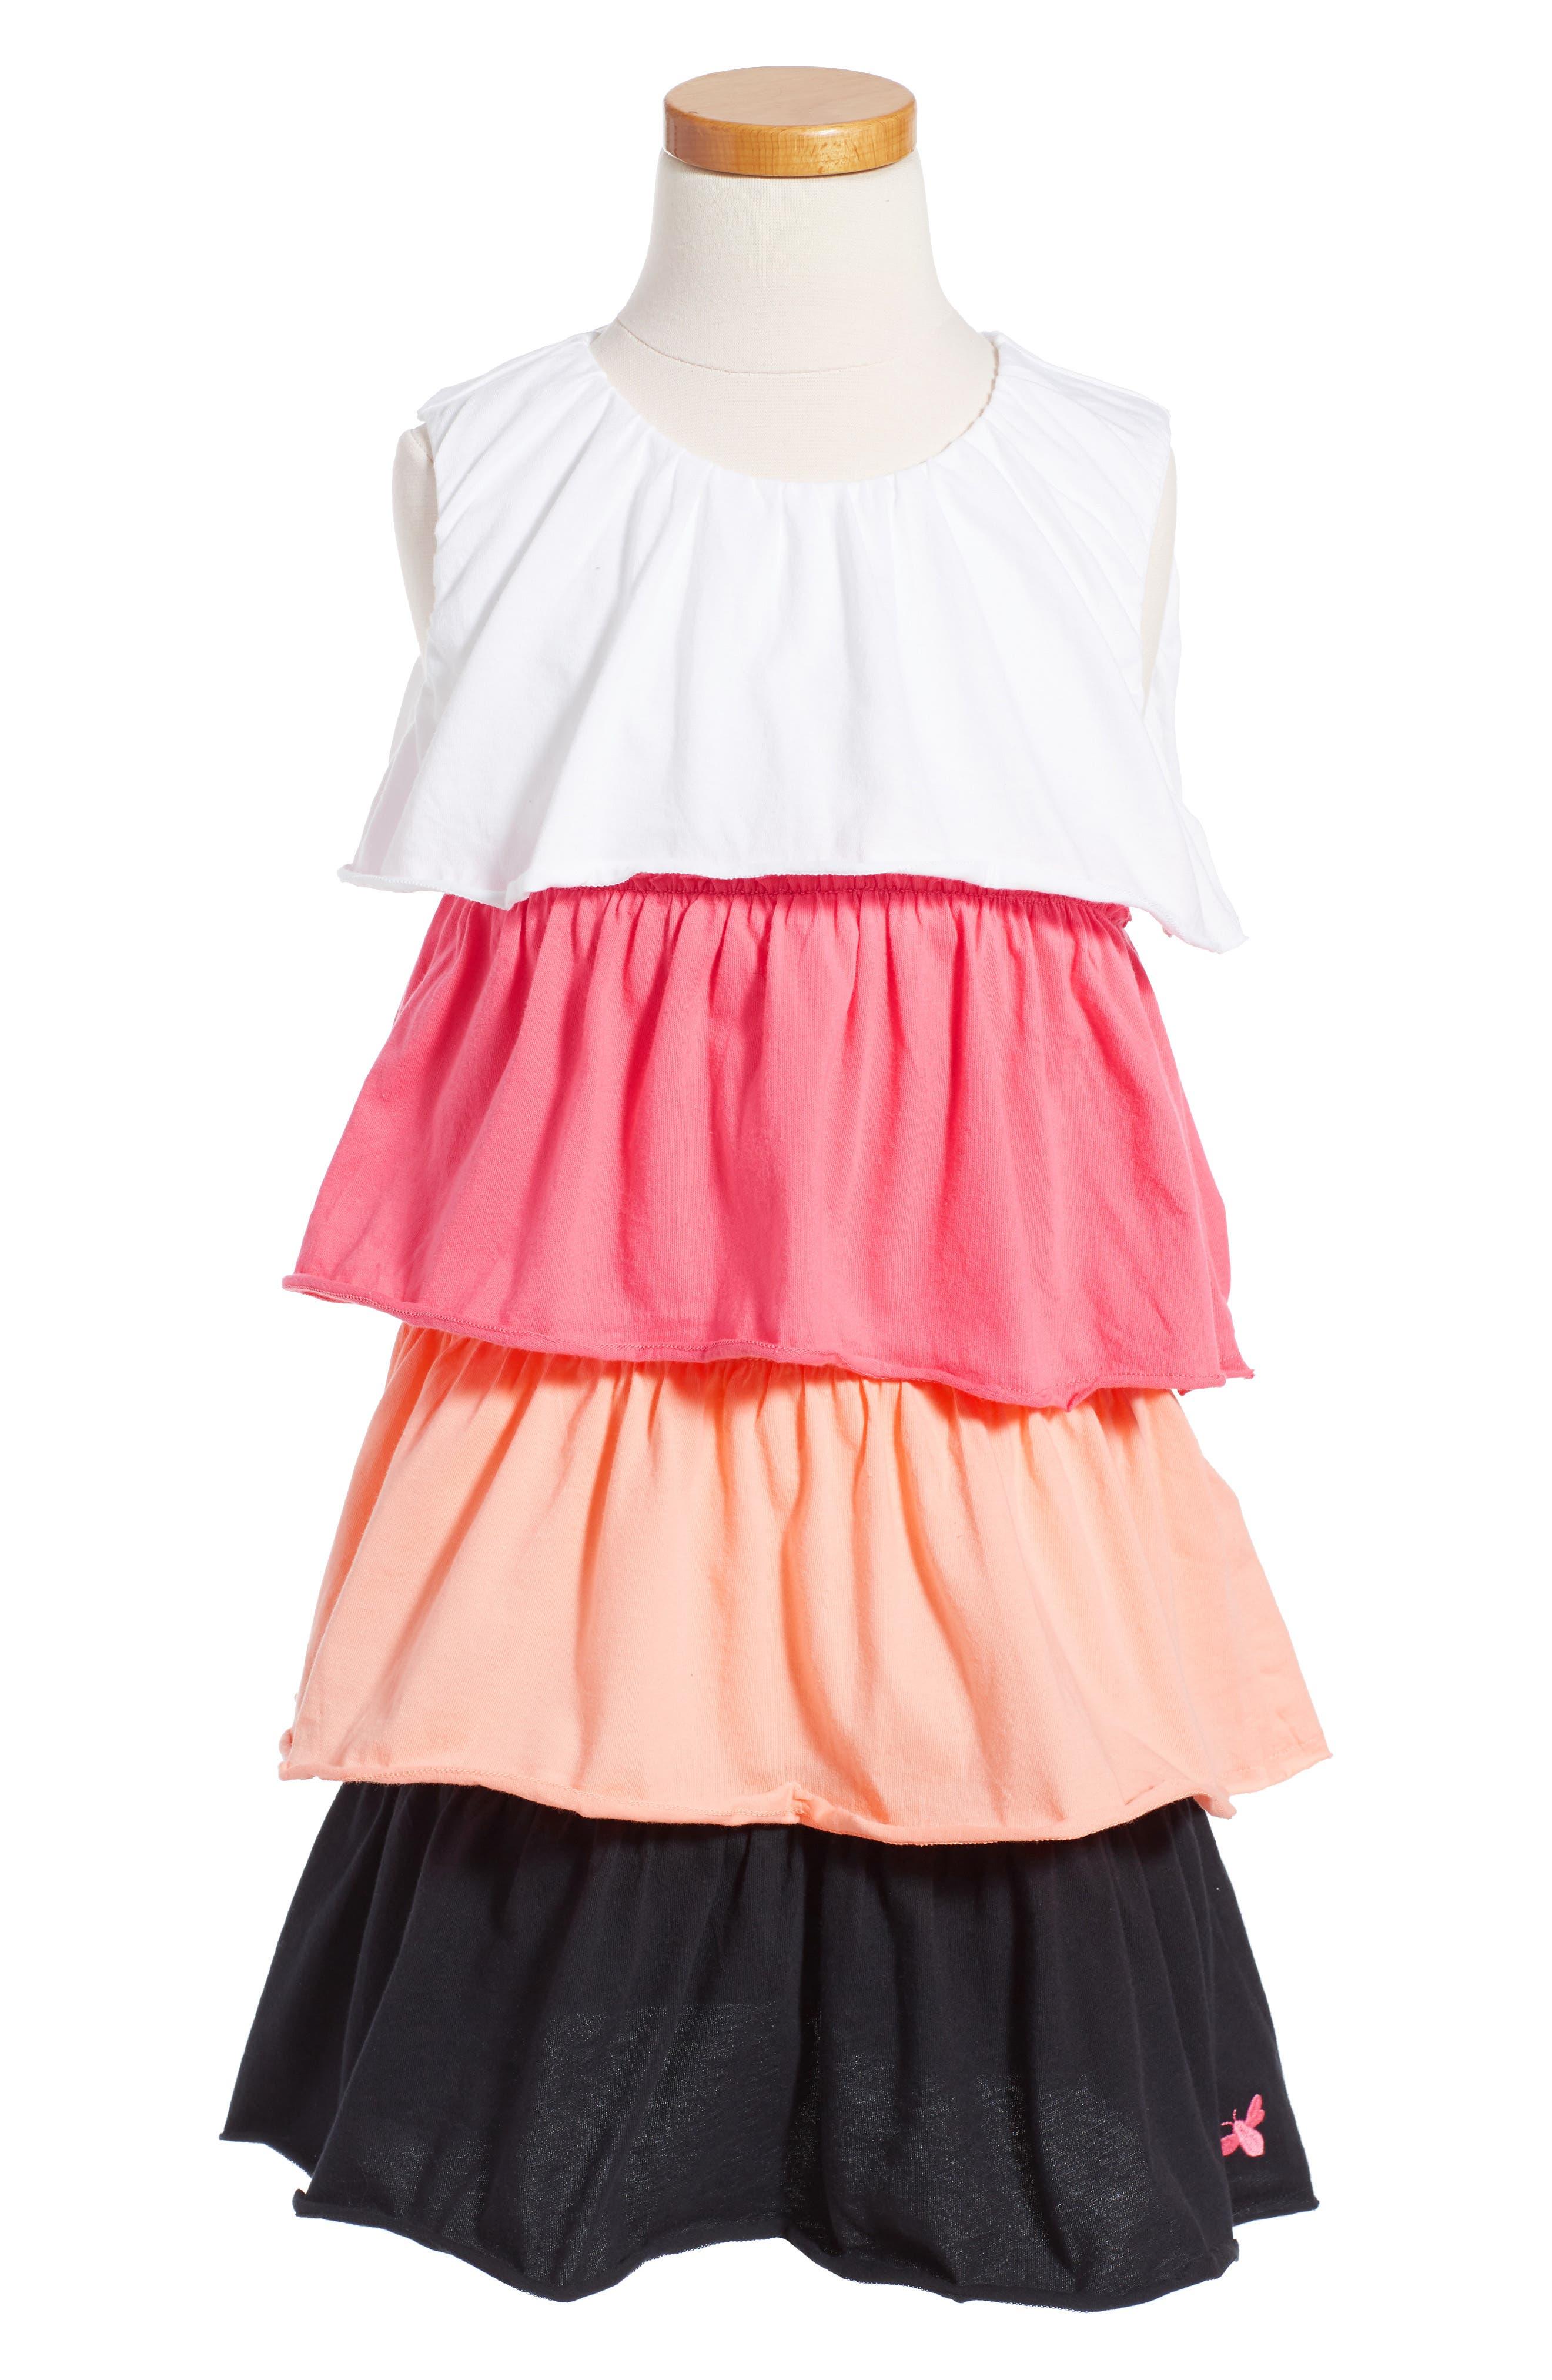 Burt's Bees Baby Organic Cotton Tiered Dress (Toddler Girls & Little Girls)